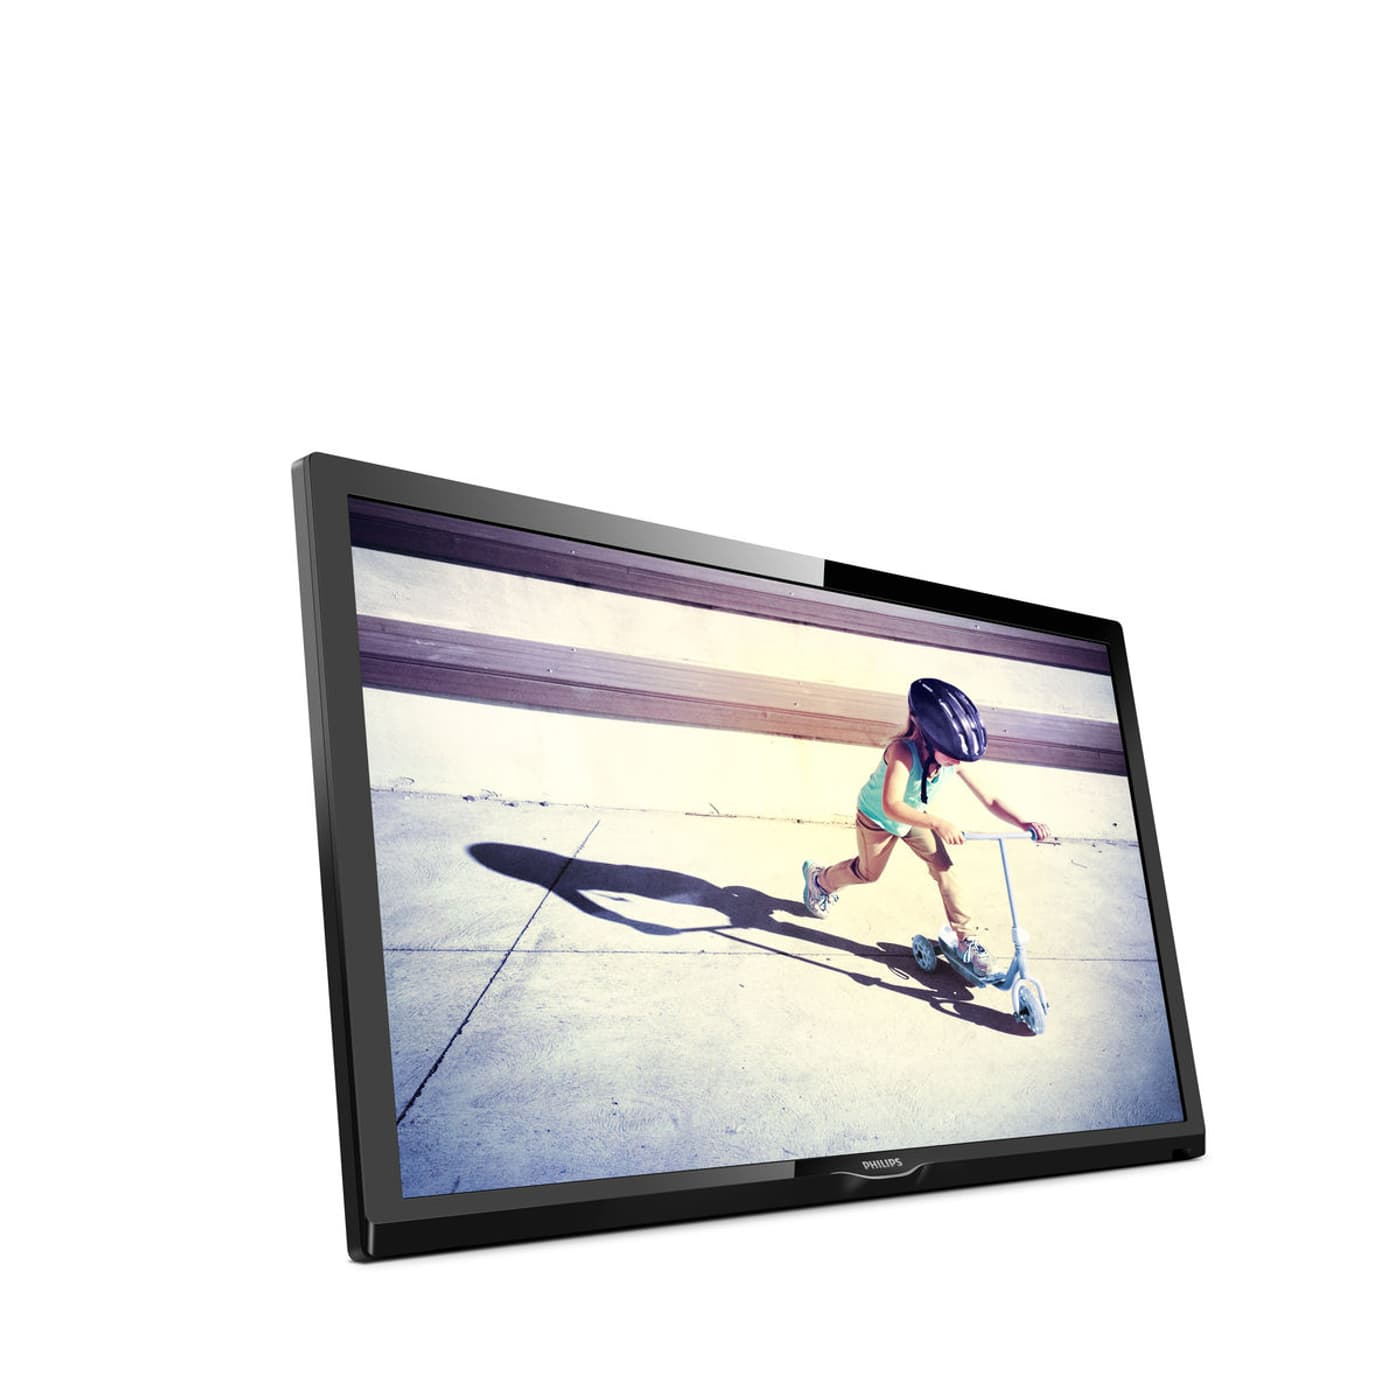 Full Hd Fernseher 55 Zoll 65 Uhd Smart Tv Ju6000 Seria 6 Hd Tv 2019 Ccd Camera Infrared: Philips 22PFS4022 55 Cm LED Fernseher